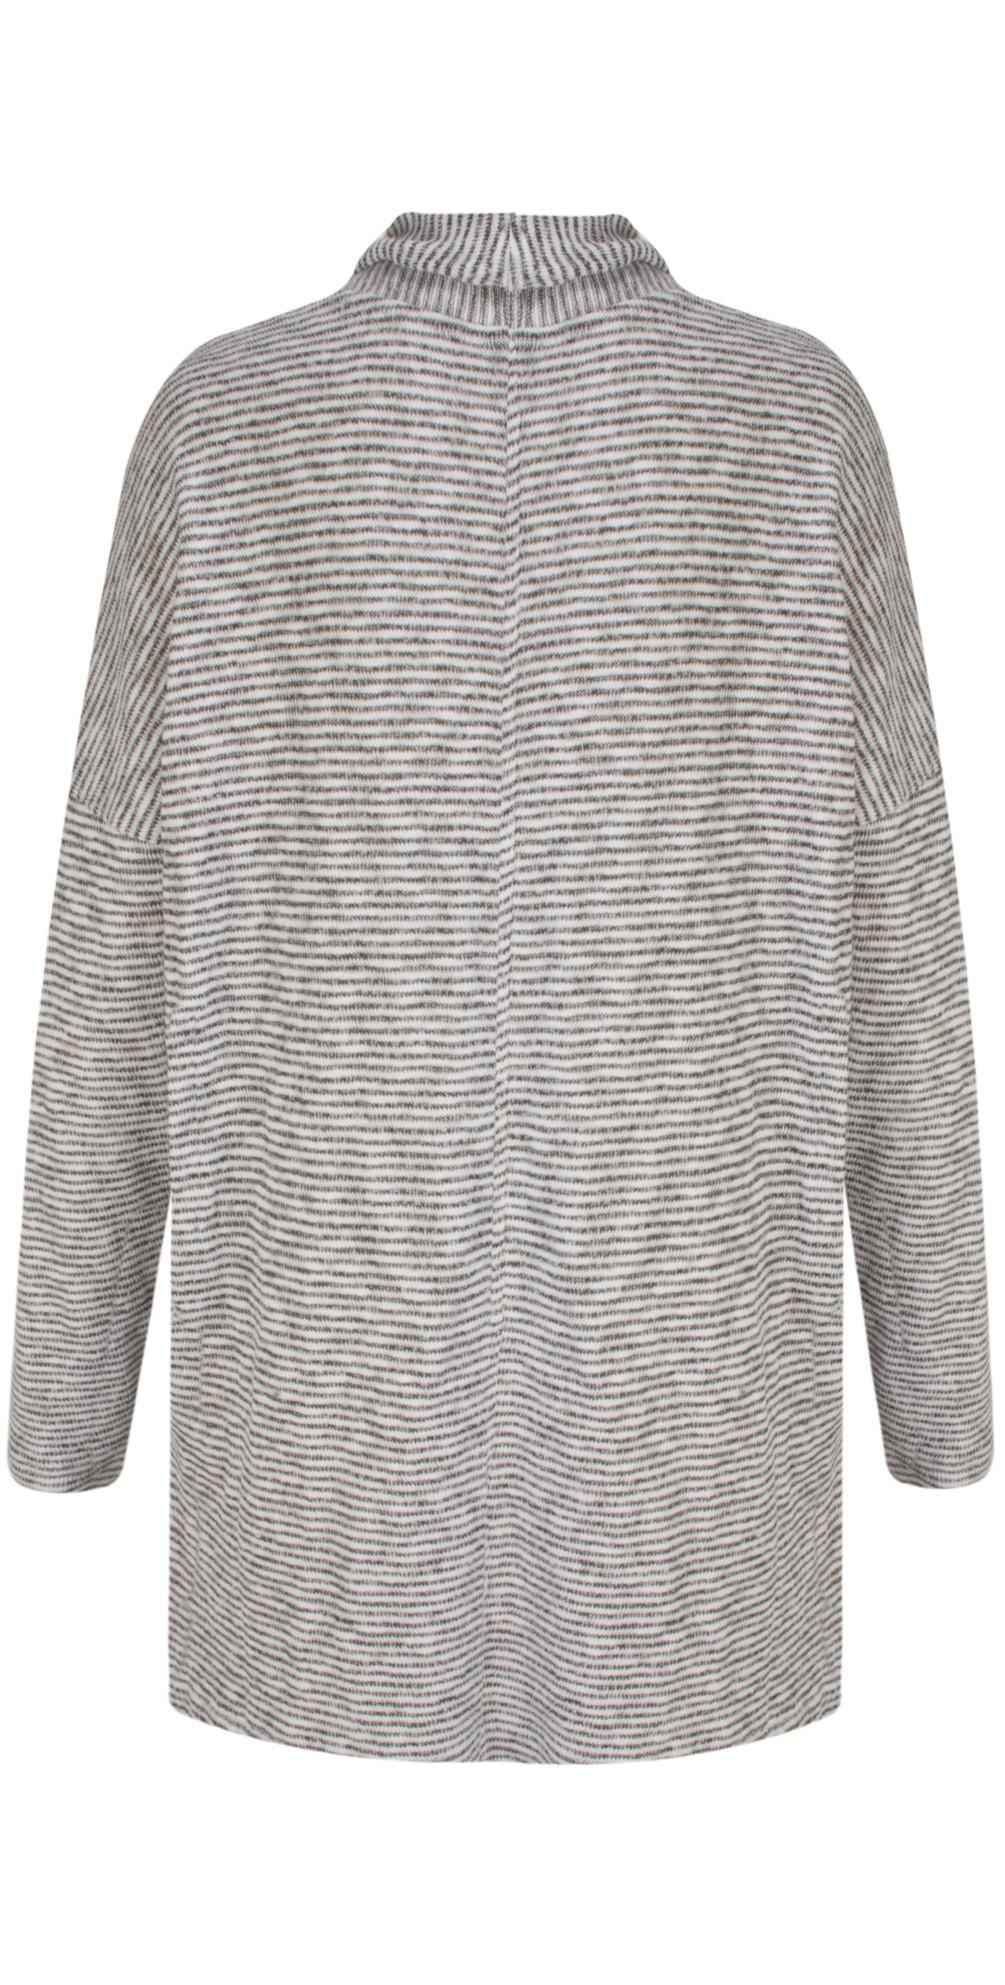 Woven Striped Jersey Cardigan main image